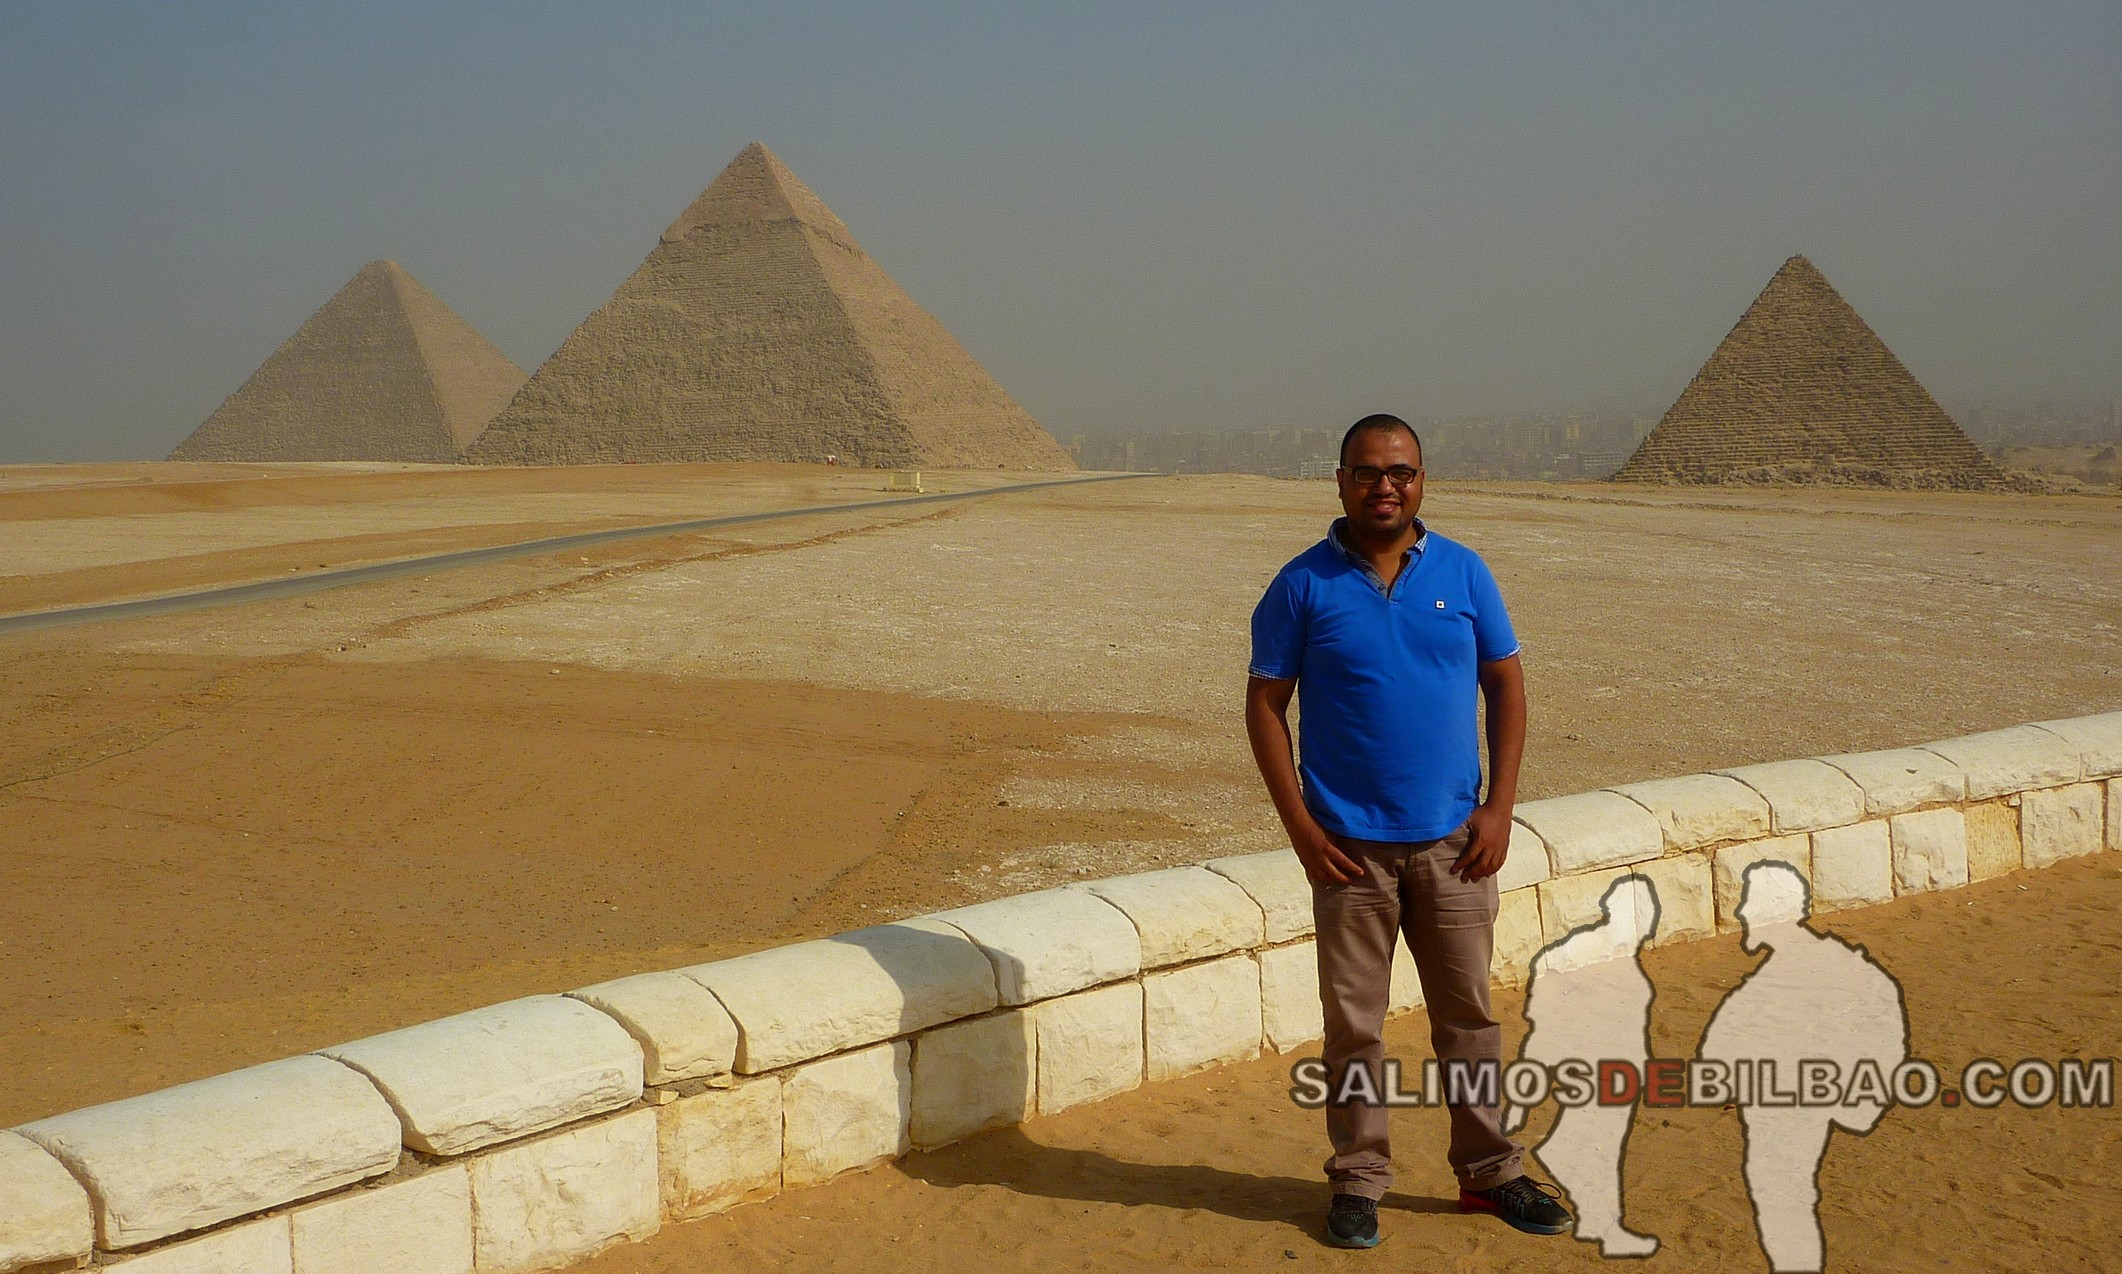 0141. Moha, Pirámides de Giza